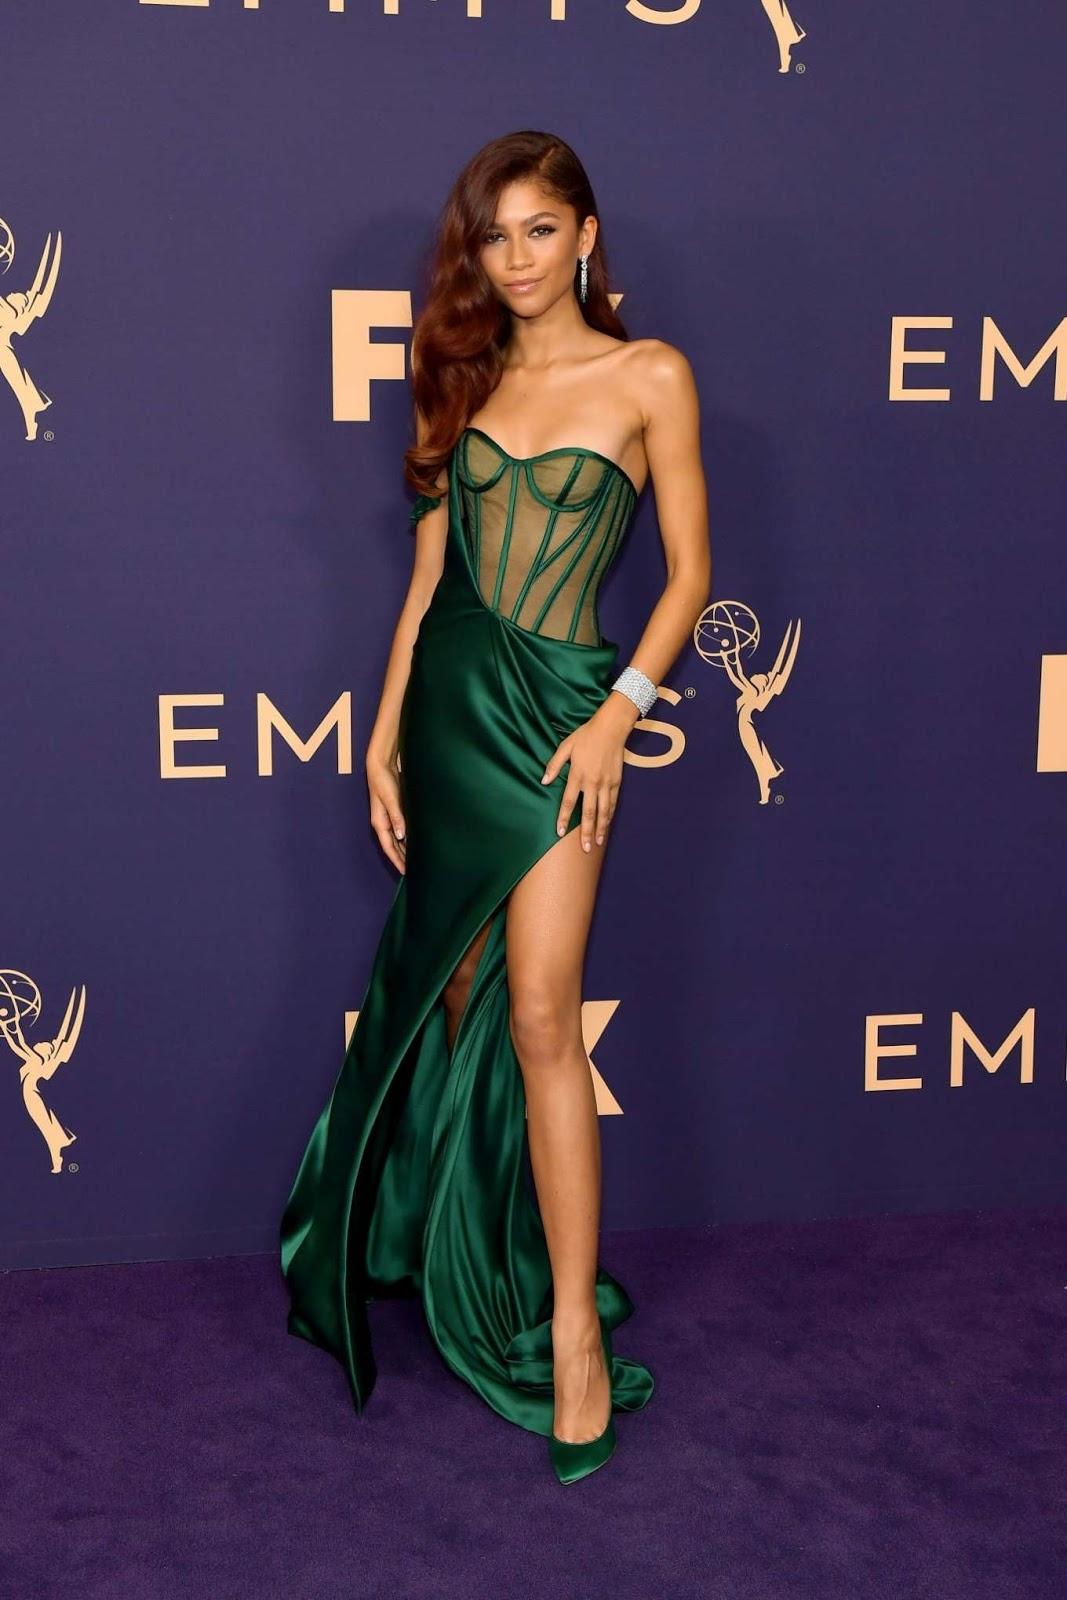 Zendaya channels Poison Ivy at the 2019 Emmy Awards